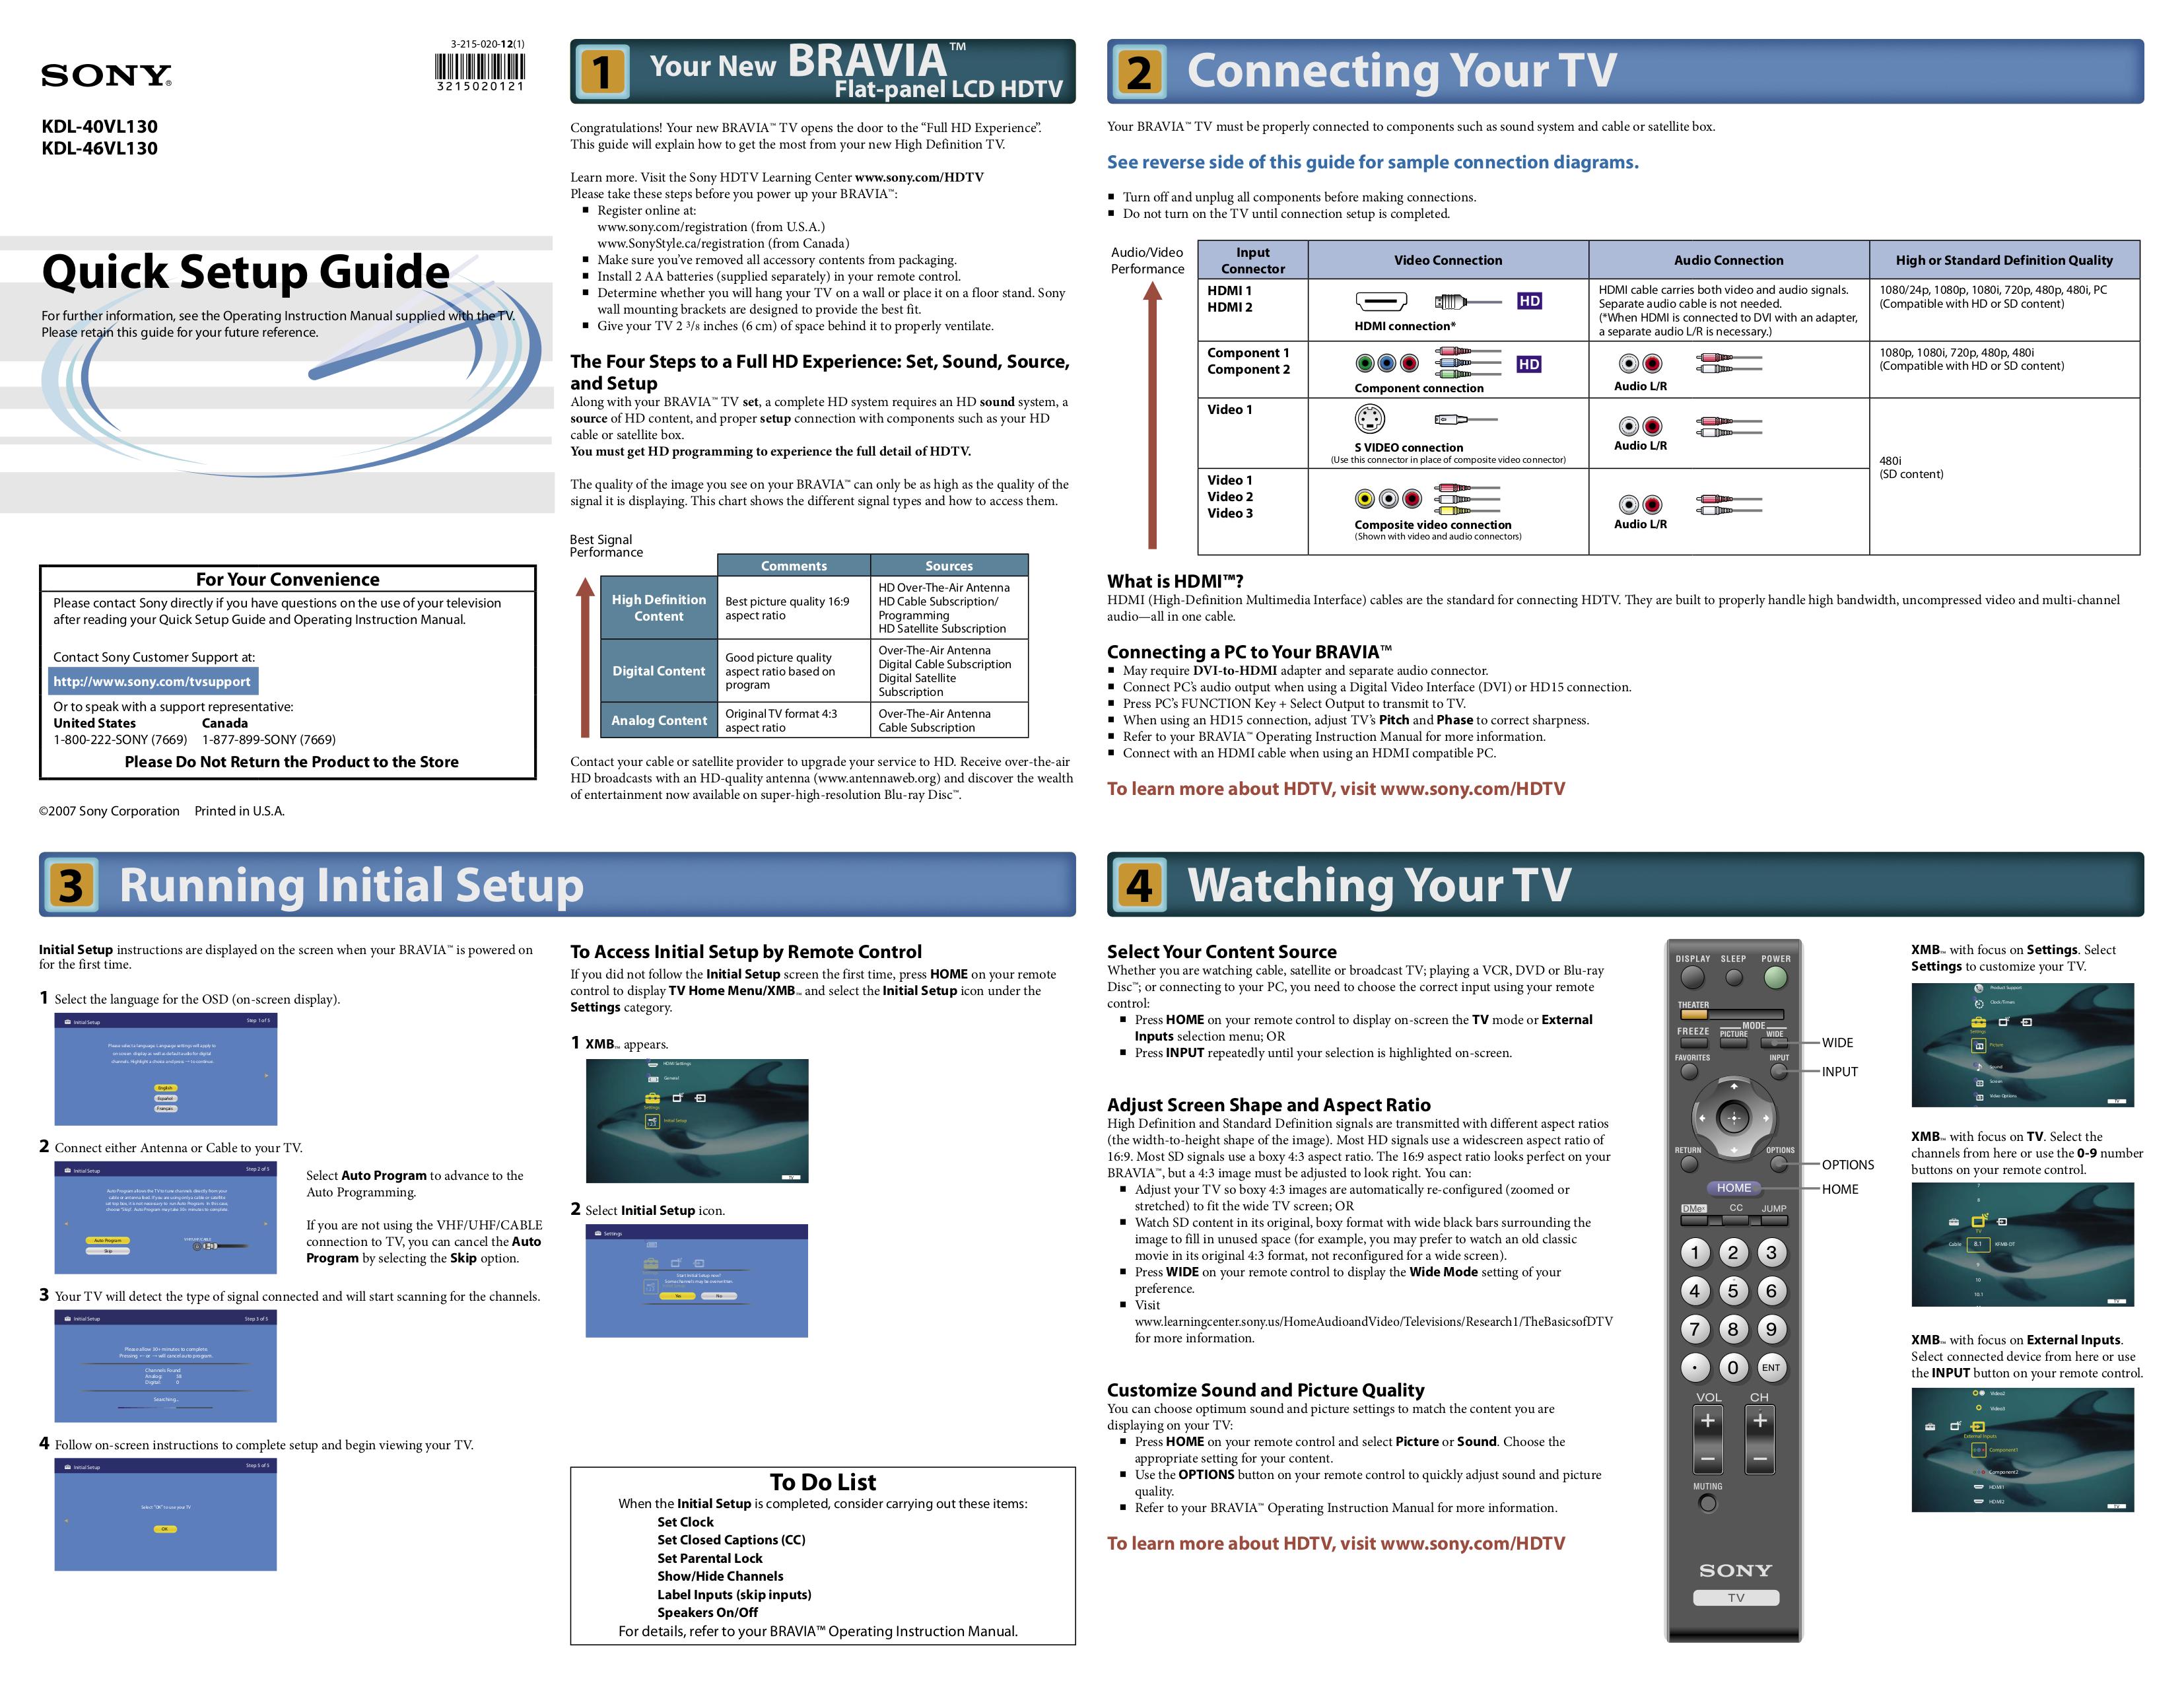 download free pdf for sony bravia kdl 40s3000 tv manual rh umlib com sony kdl-40s3000 specs sony bravia kdl-40s3000 manual